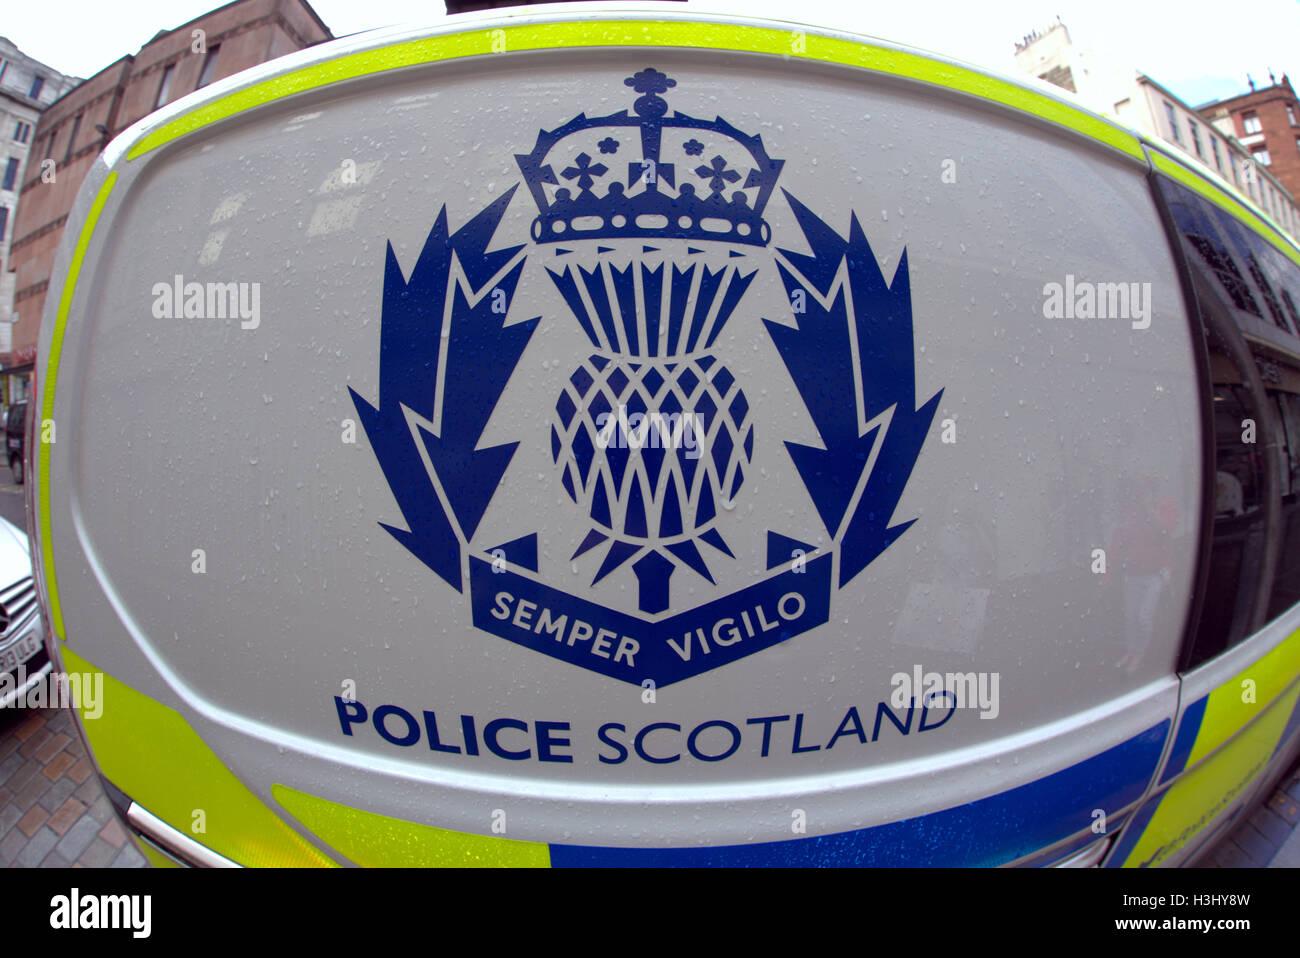 big brother eye police Scotland logos logo on vehicle sides Stock Photo